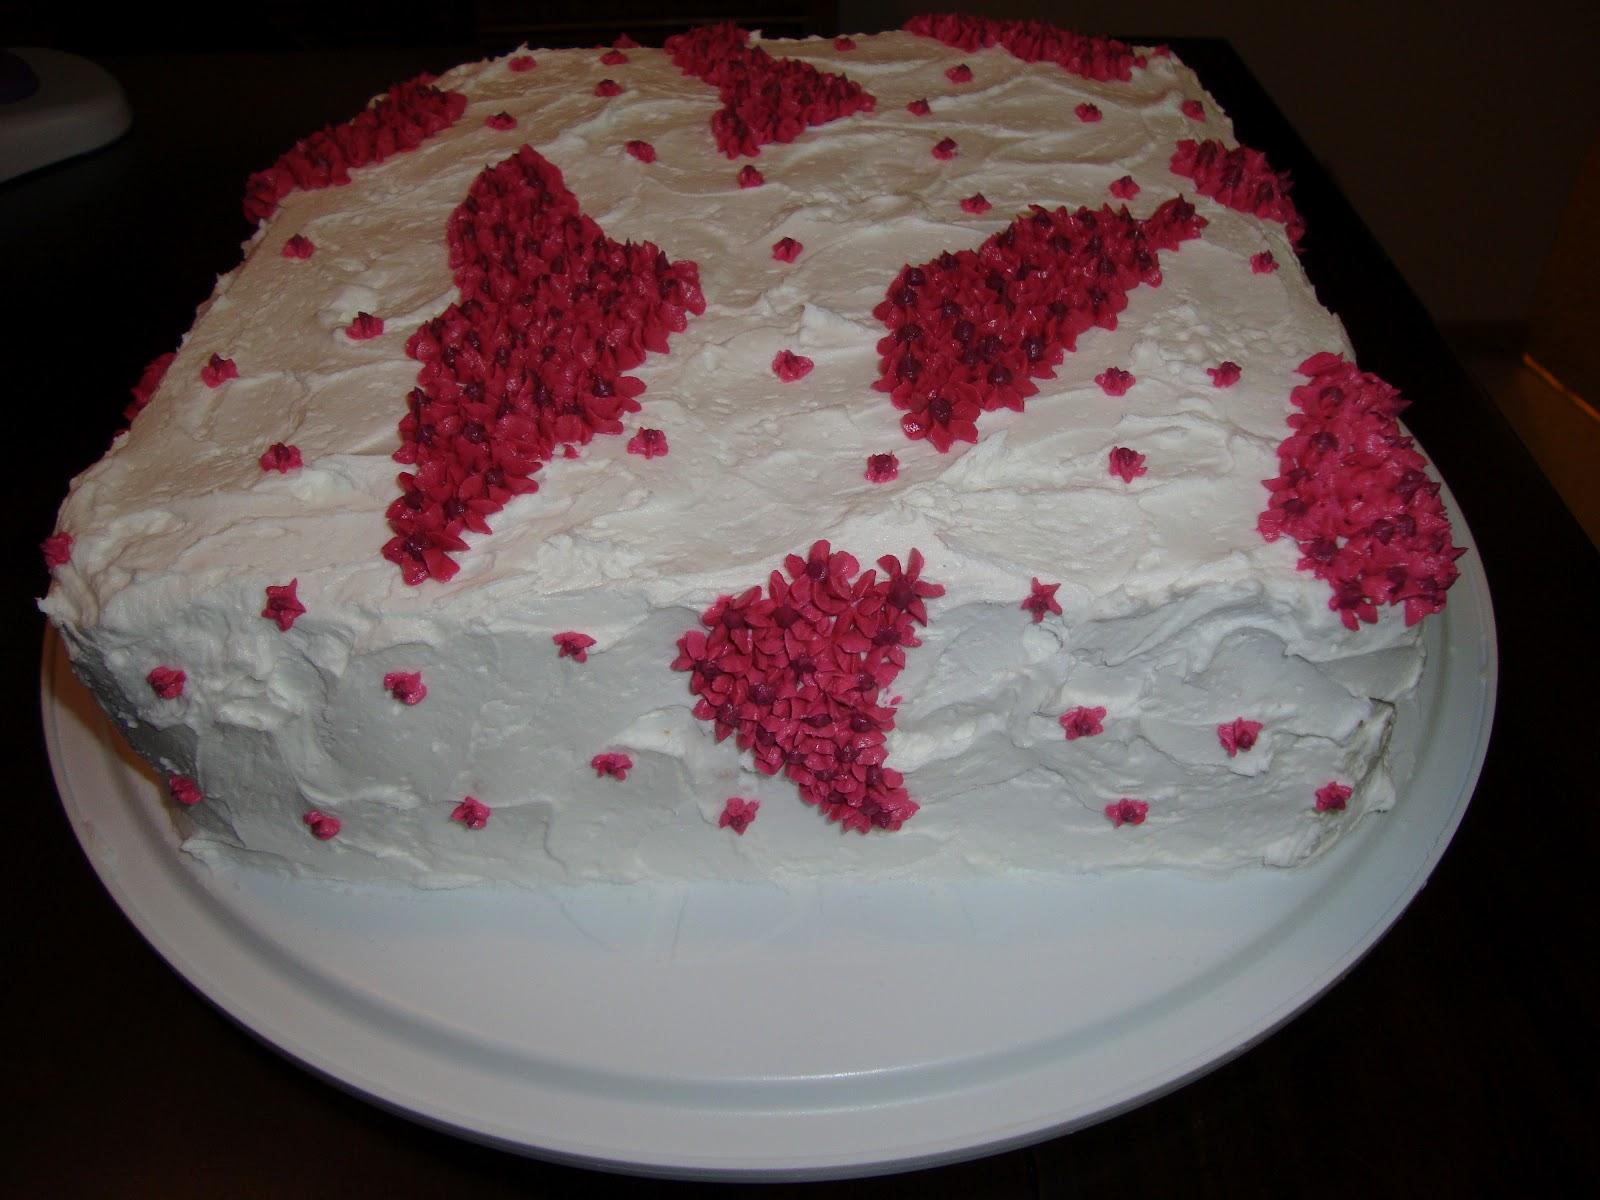 Half Moon Cakes An Elegant Birthday Cake For An Elegant Lady